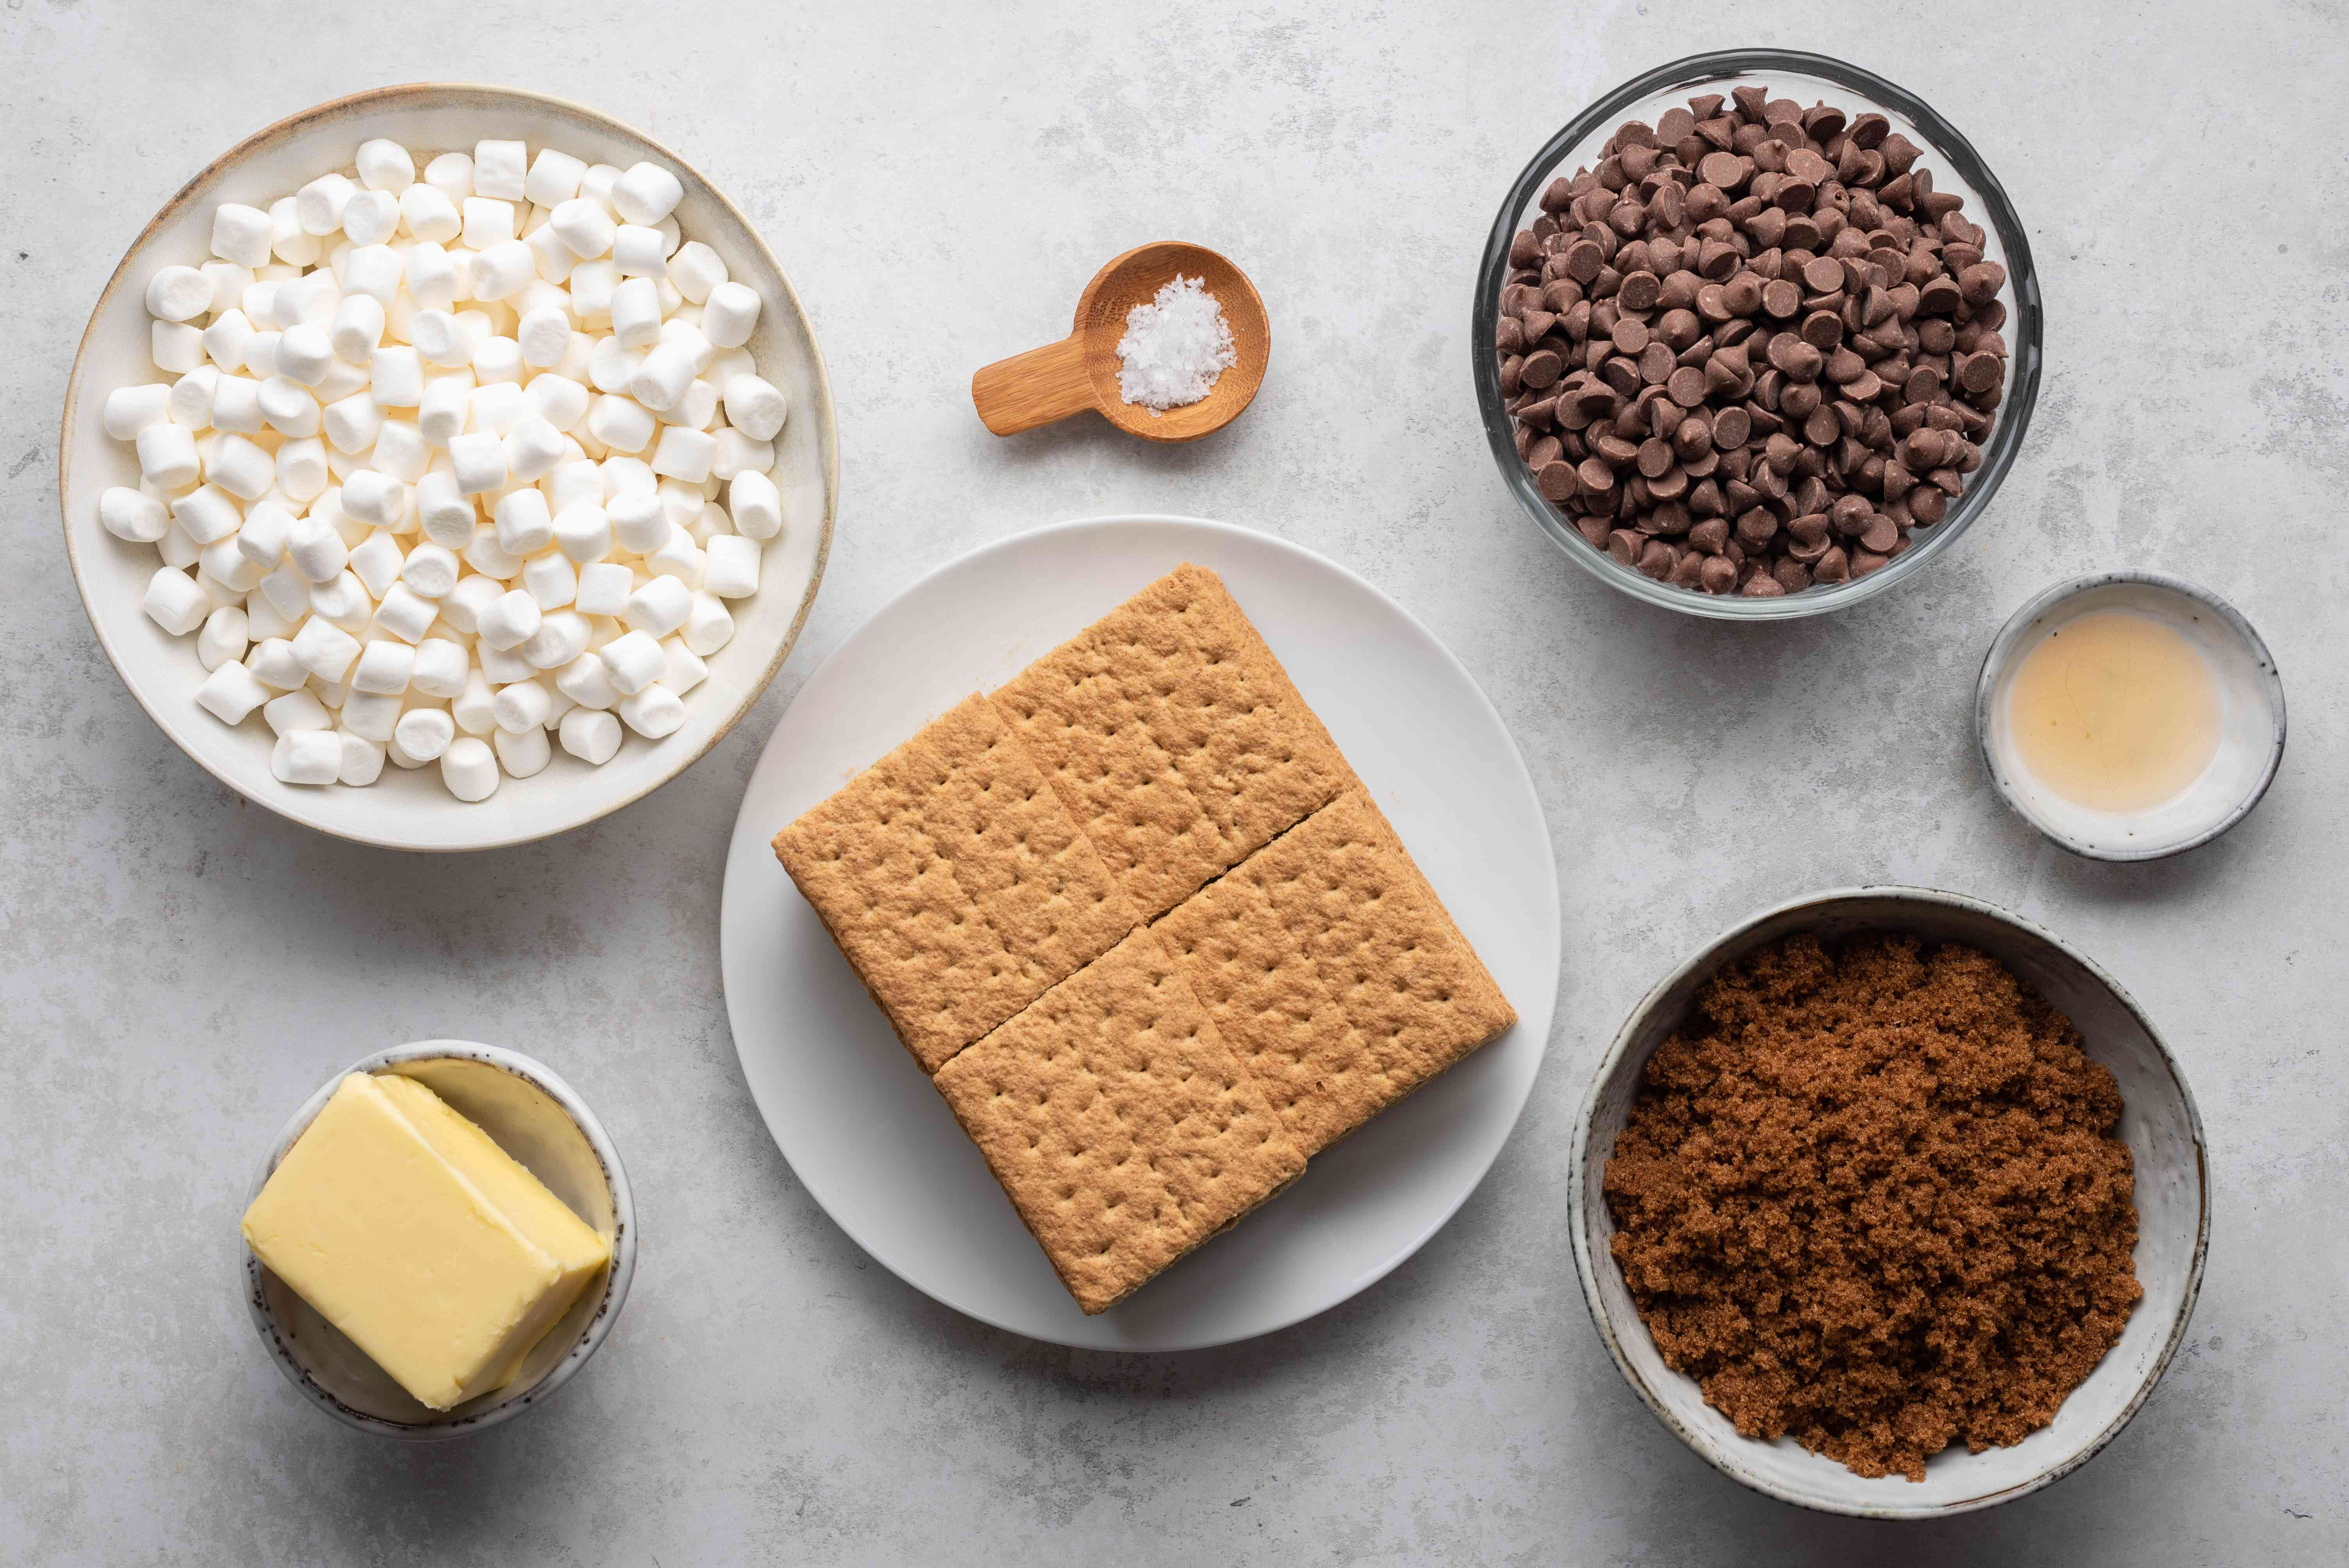 S'mores Toffee Bark ingredients